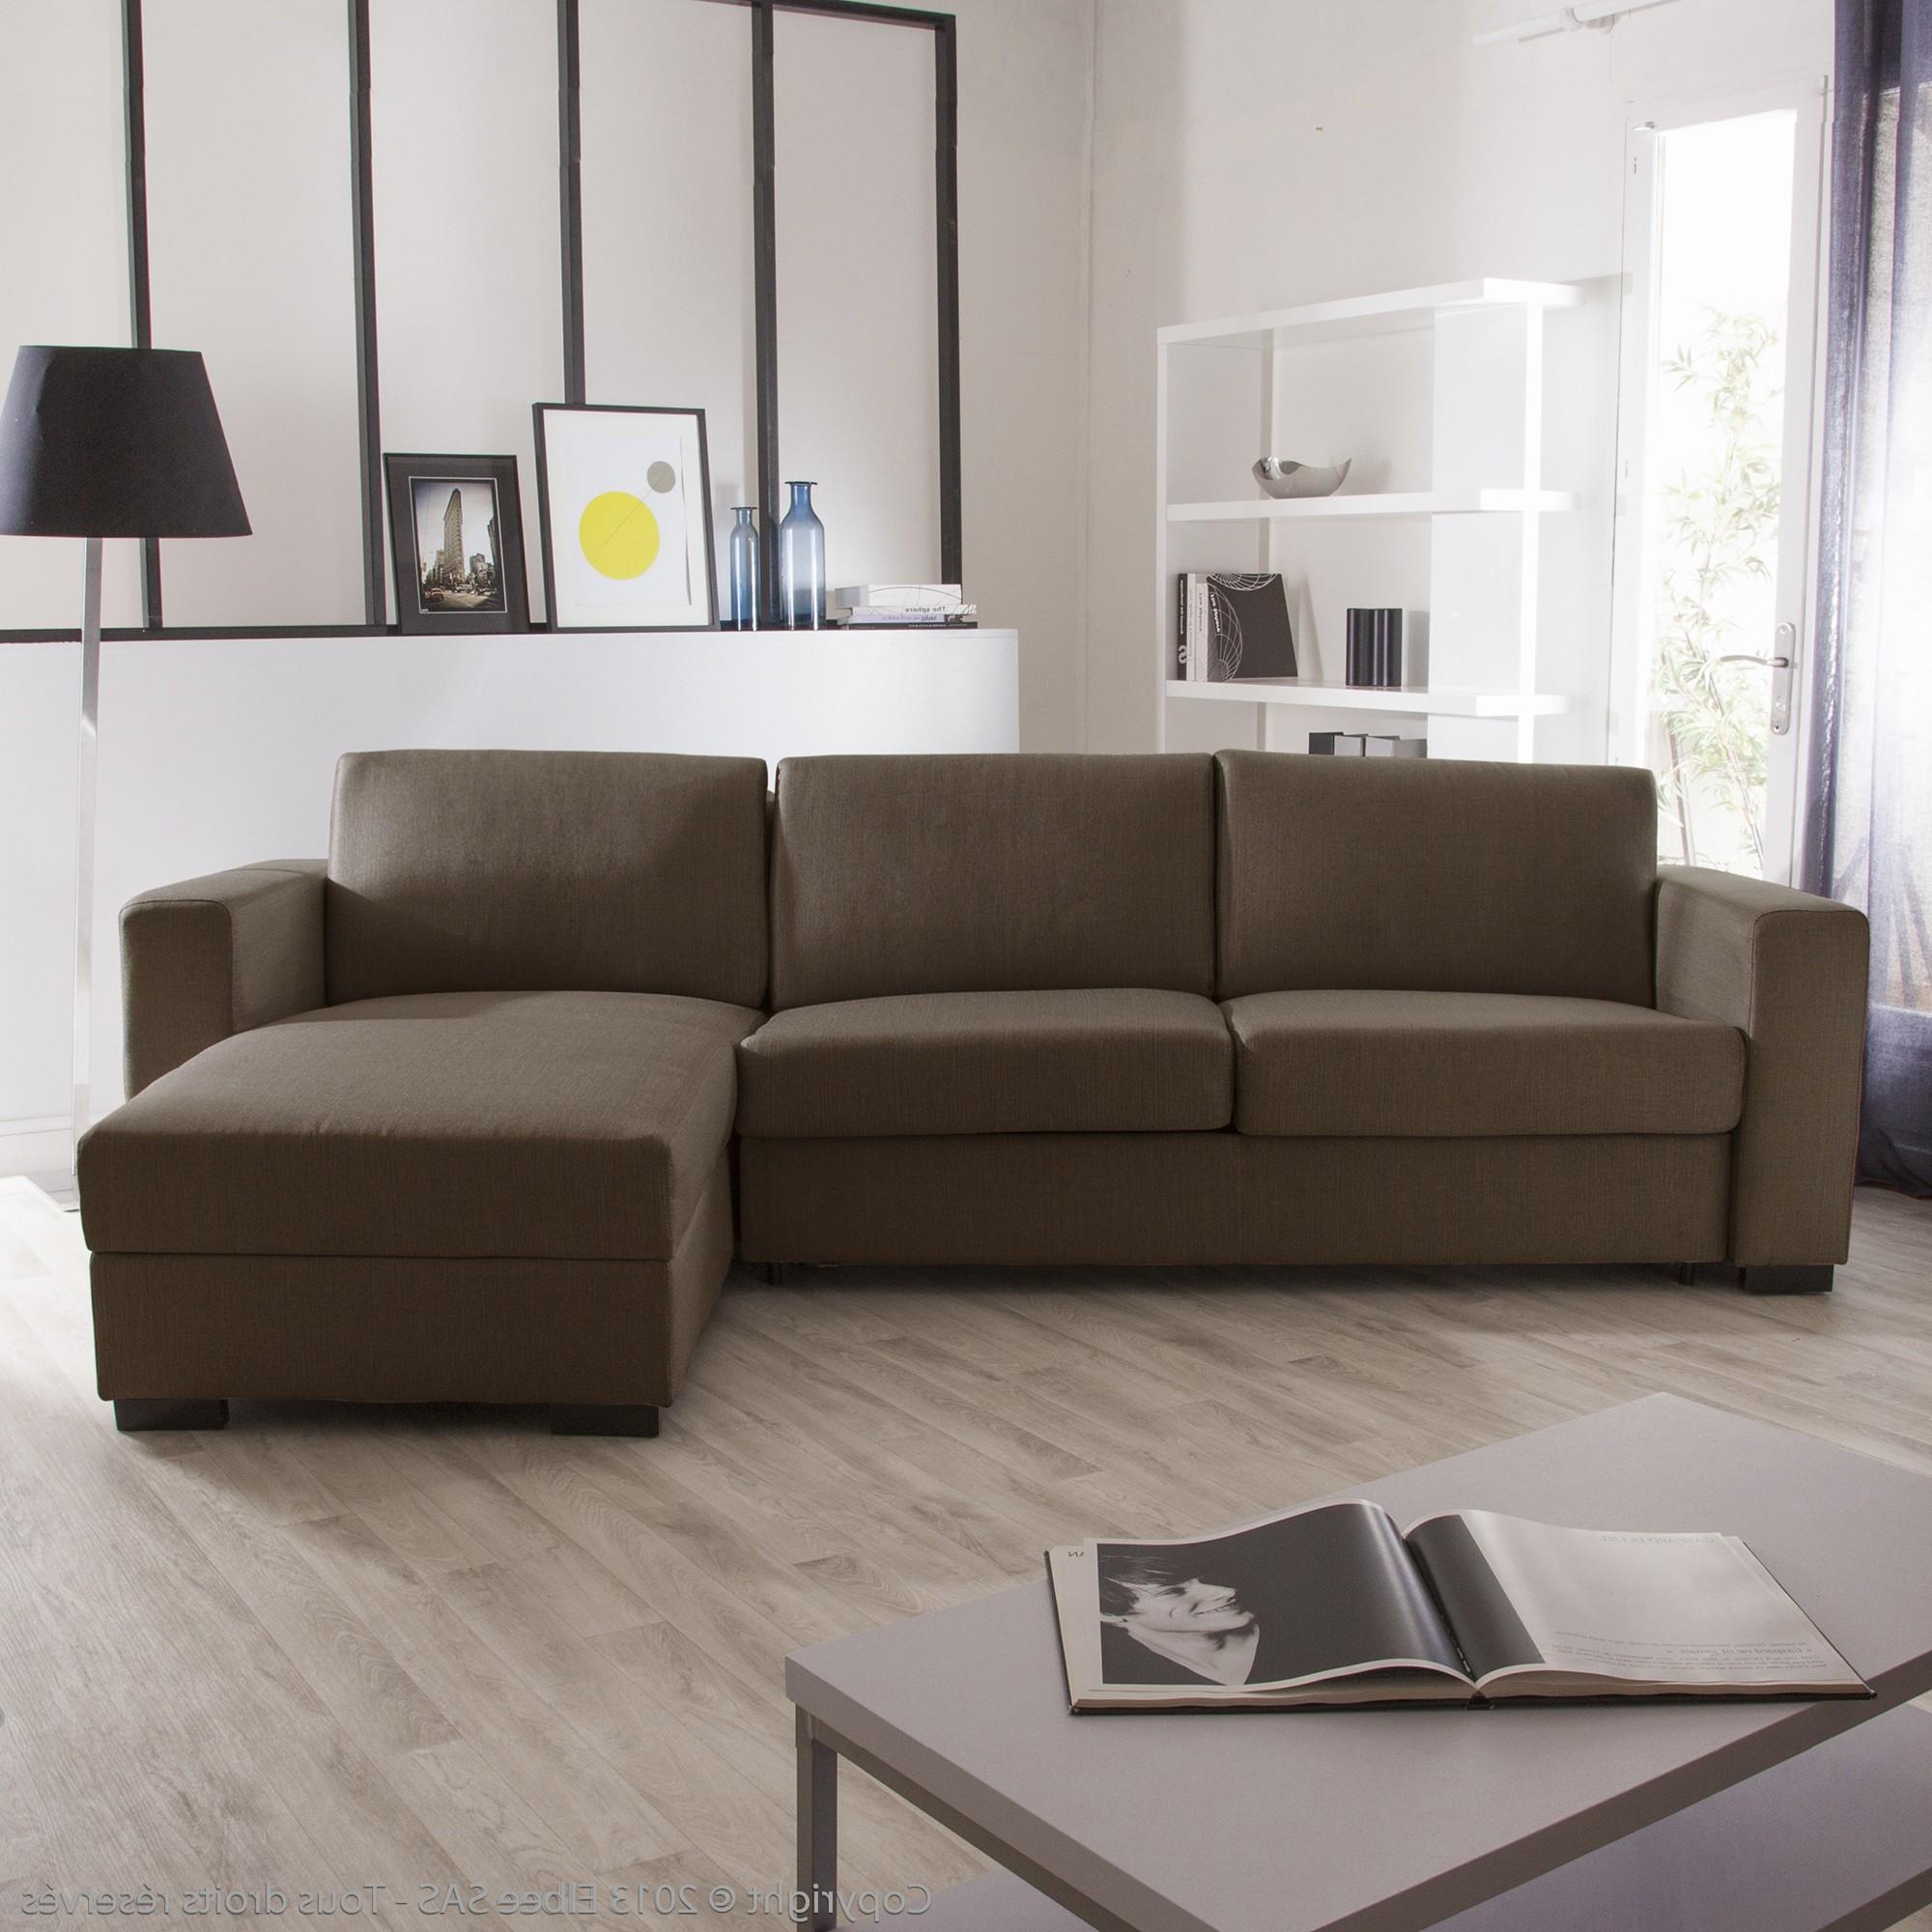 canap d 39 angle convertible chocolat tissu canap id es. Black Bedroom Furniture Sets. Home Design Ideas